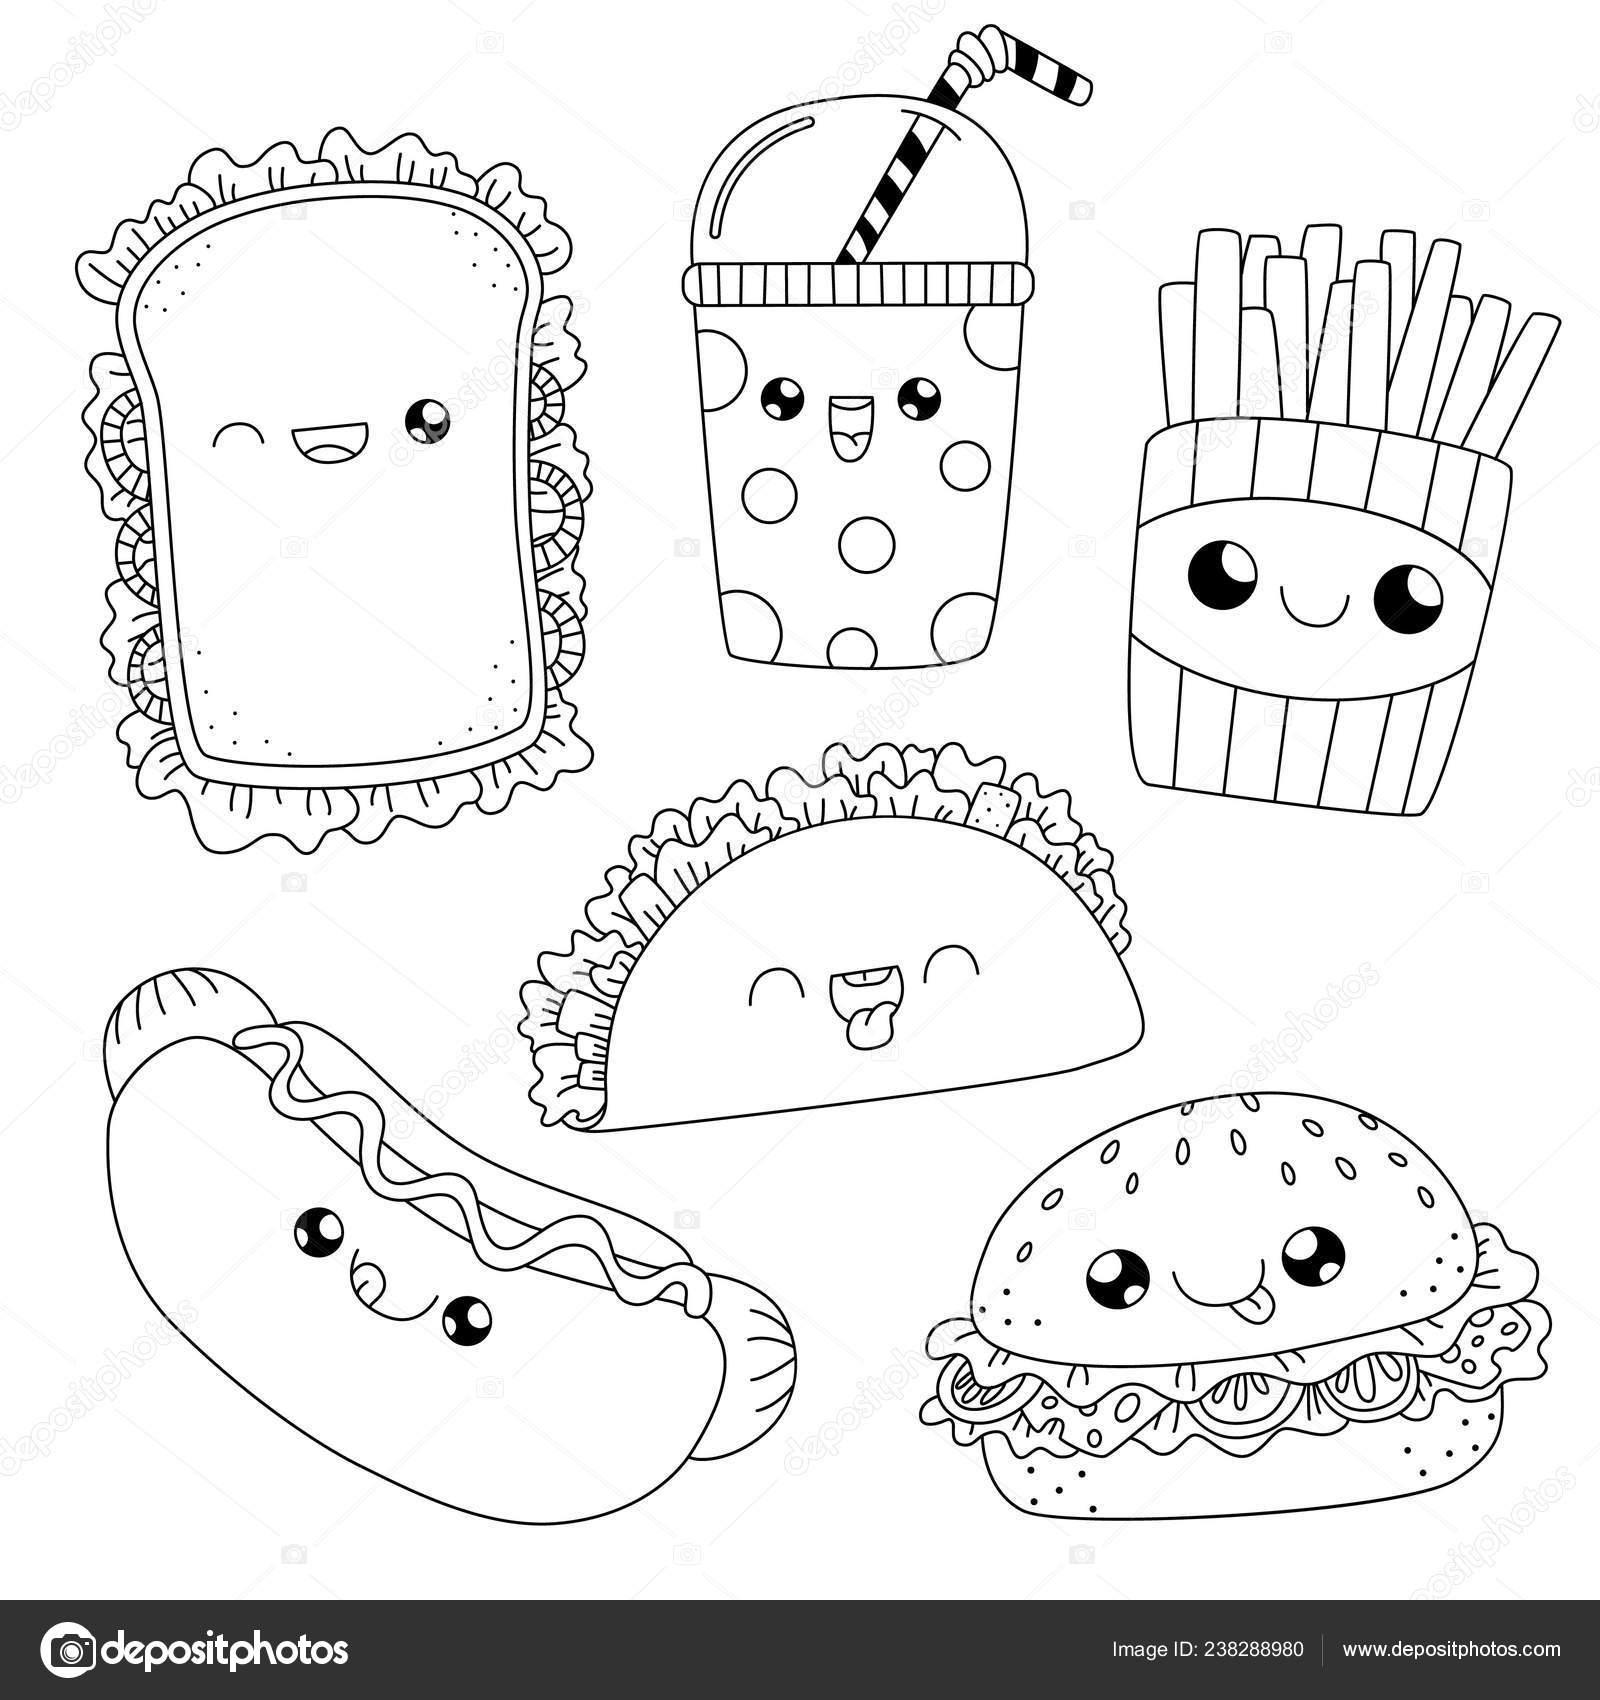 Book Fast Potraviny Doodle Omalovanky